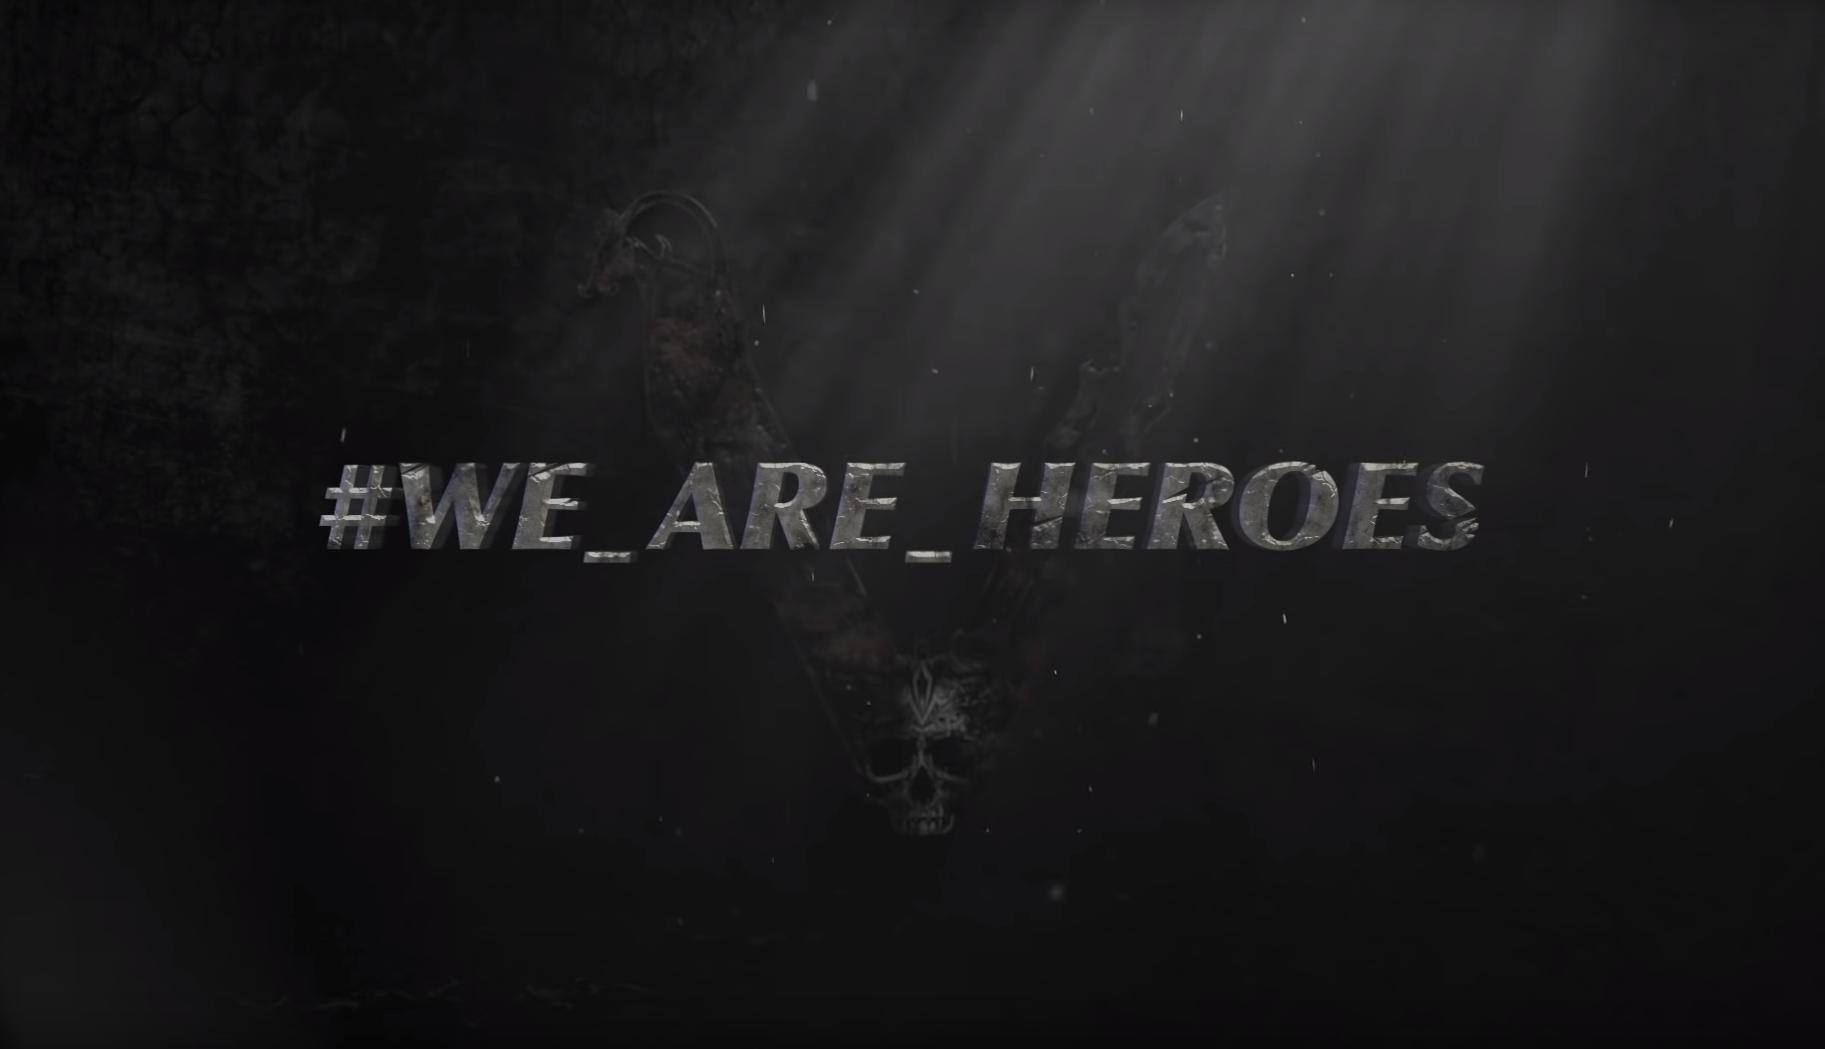 [Vindictus] #WE_ARE_HEROES: Gergo Fabian's Hero Story